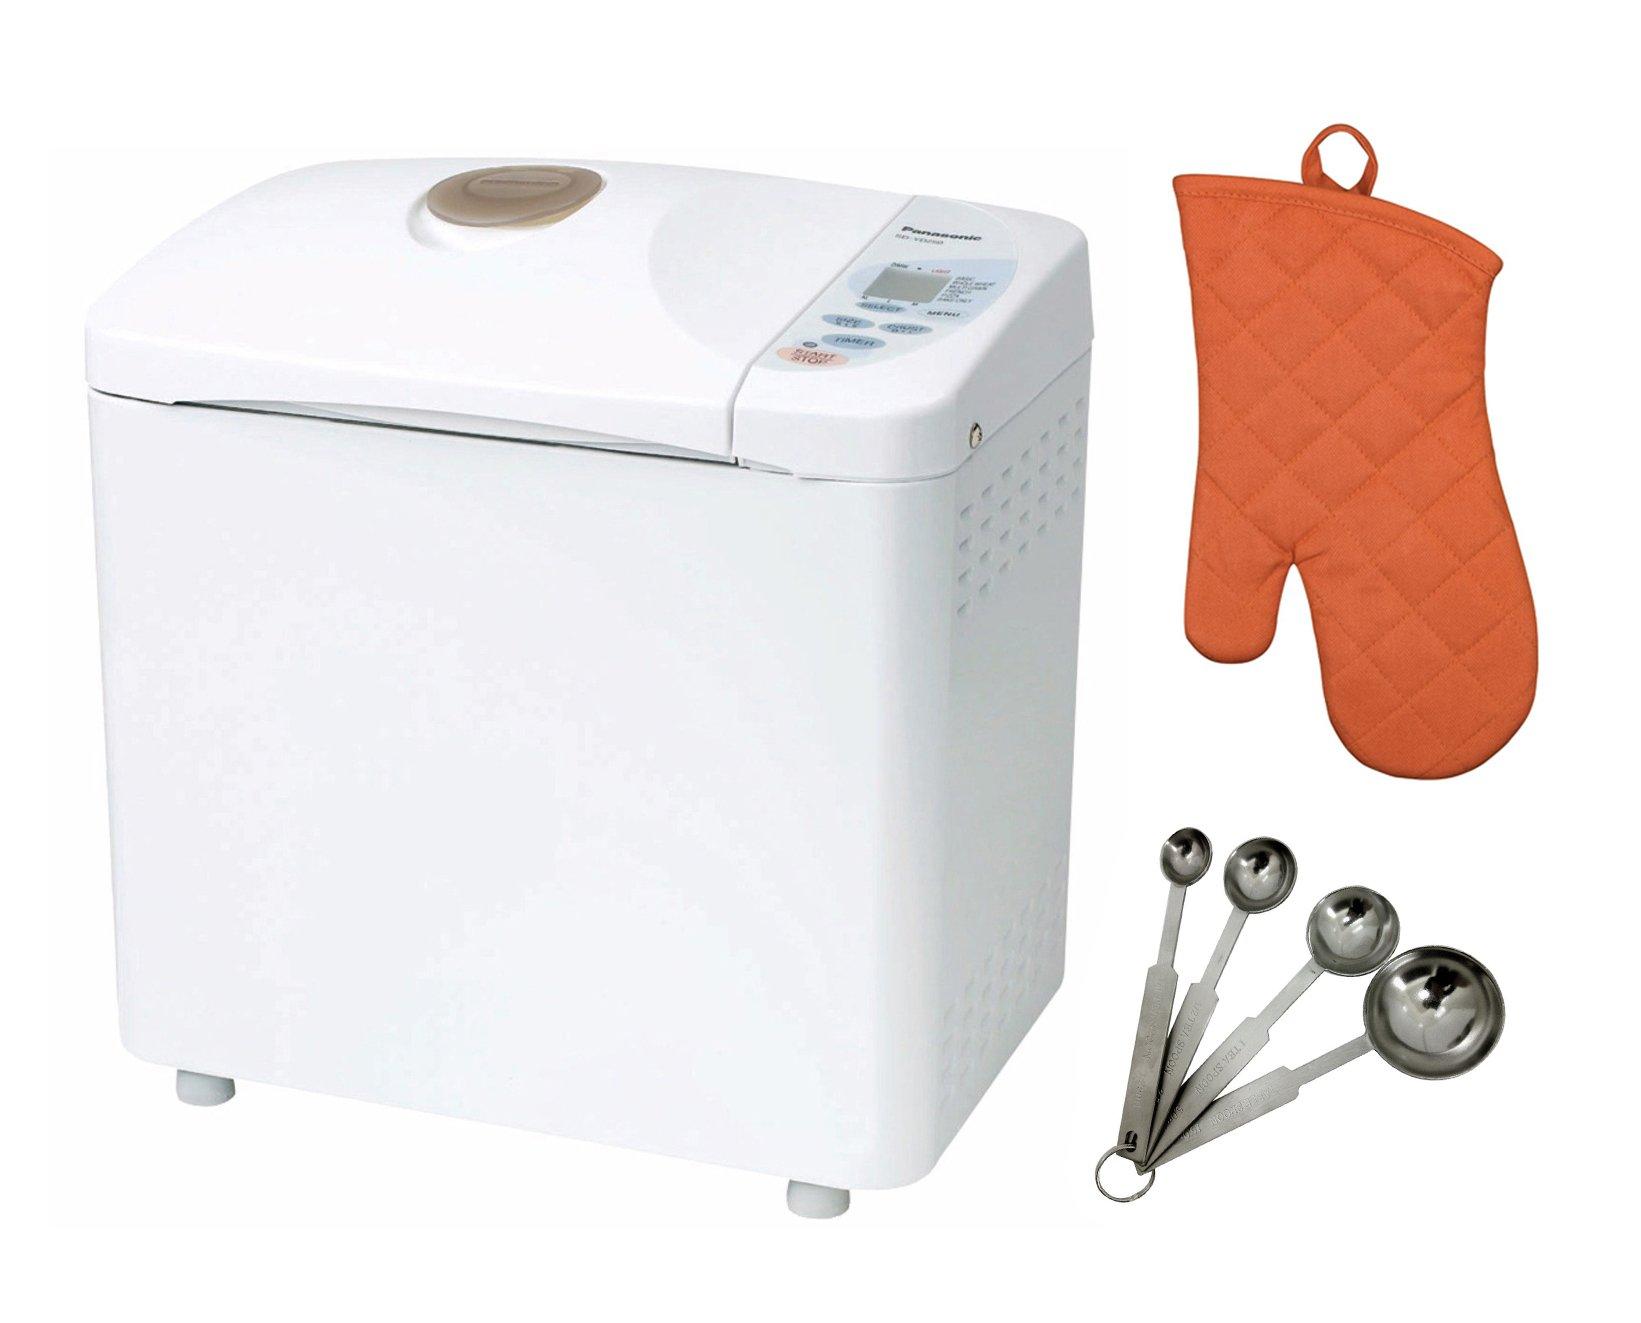 Panasonic Automatic Bread Maker w/ Measuring Spoon Set & Oven Mitt